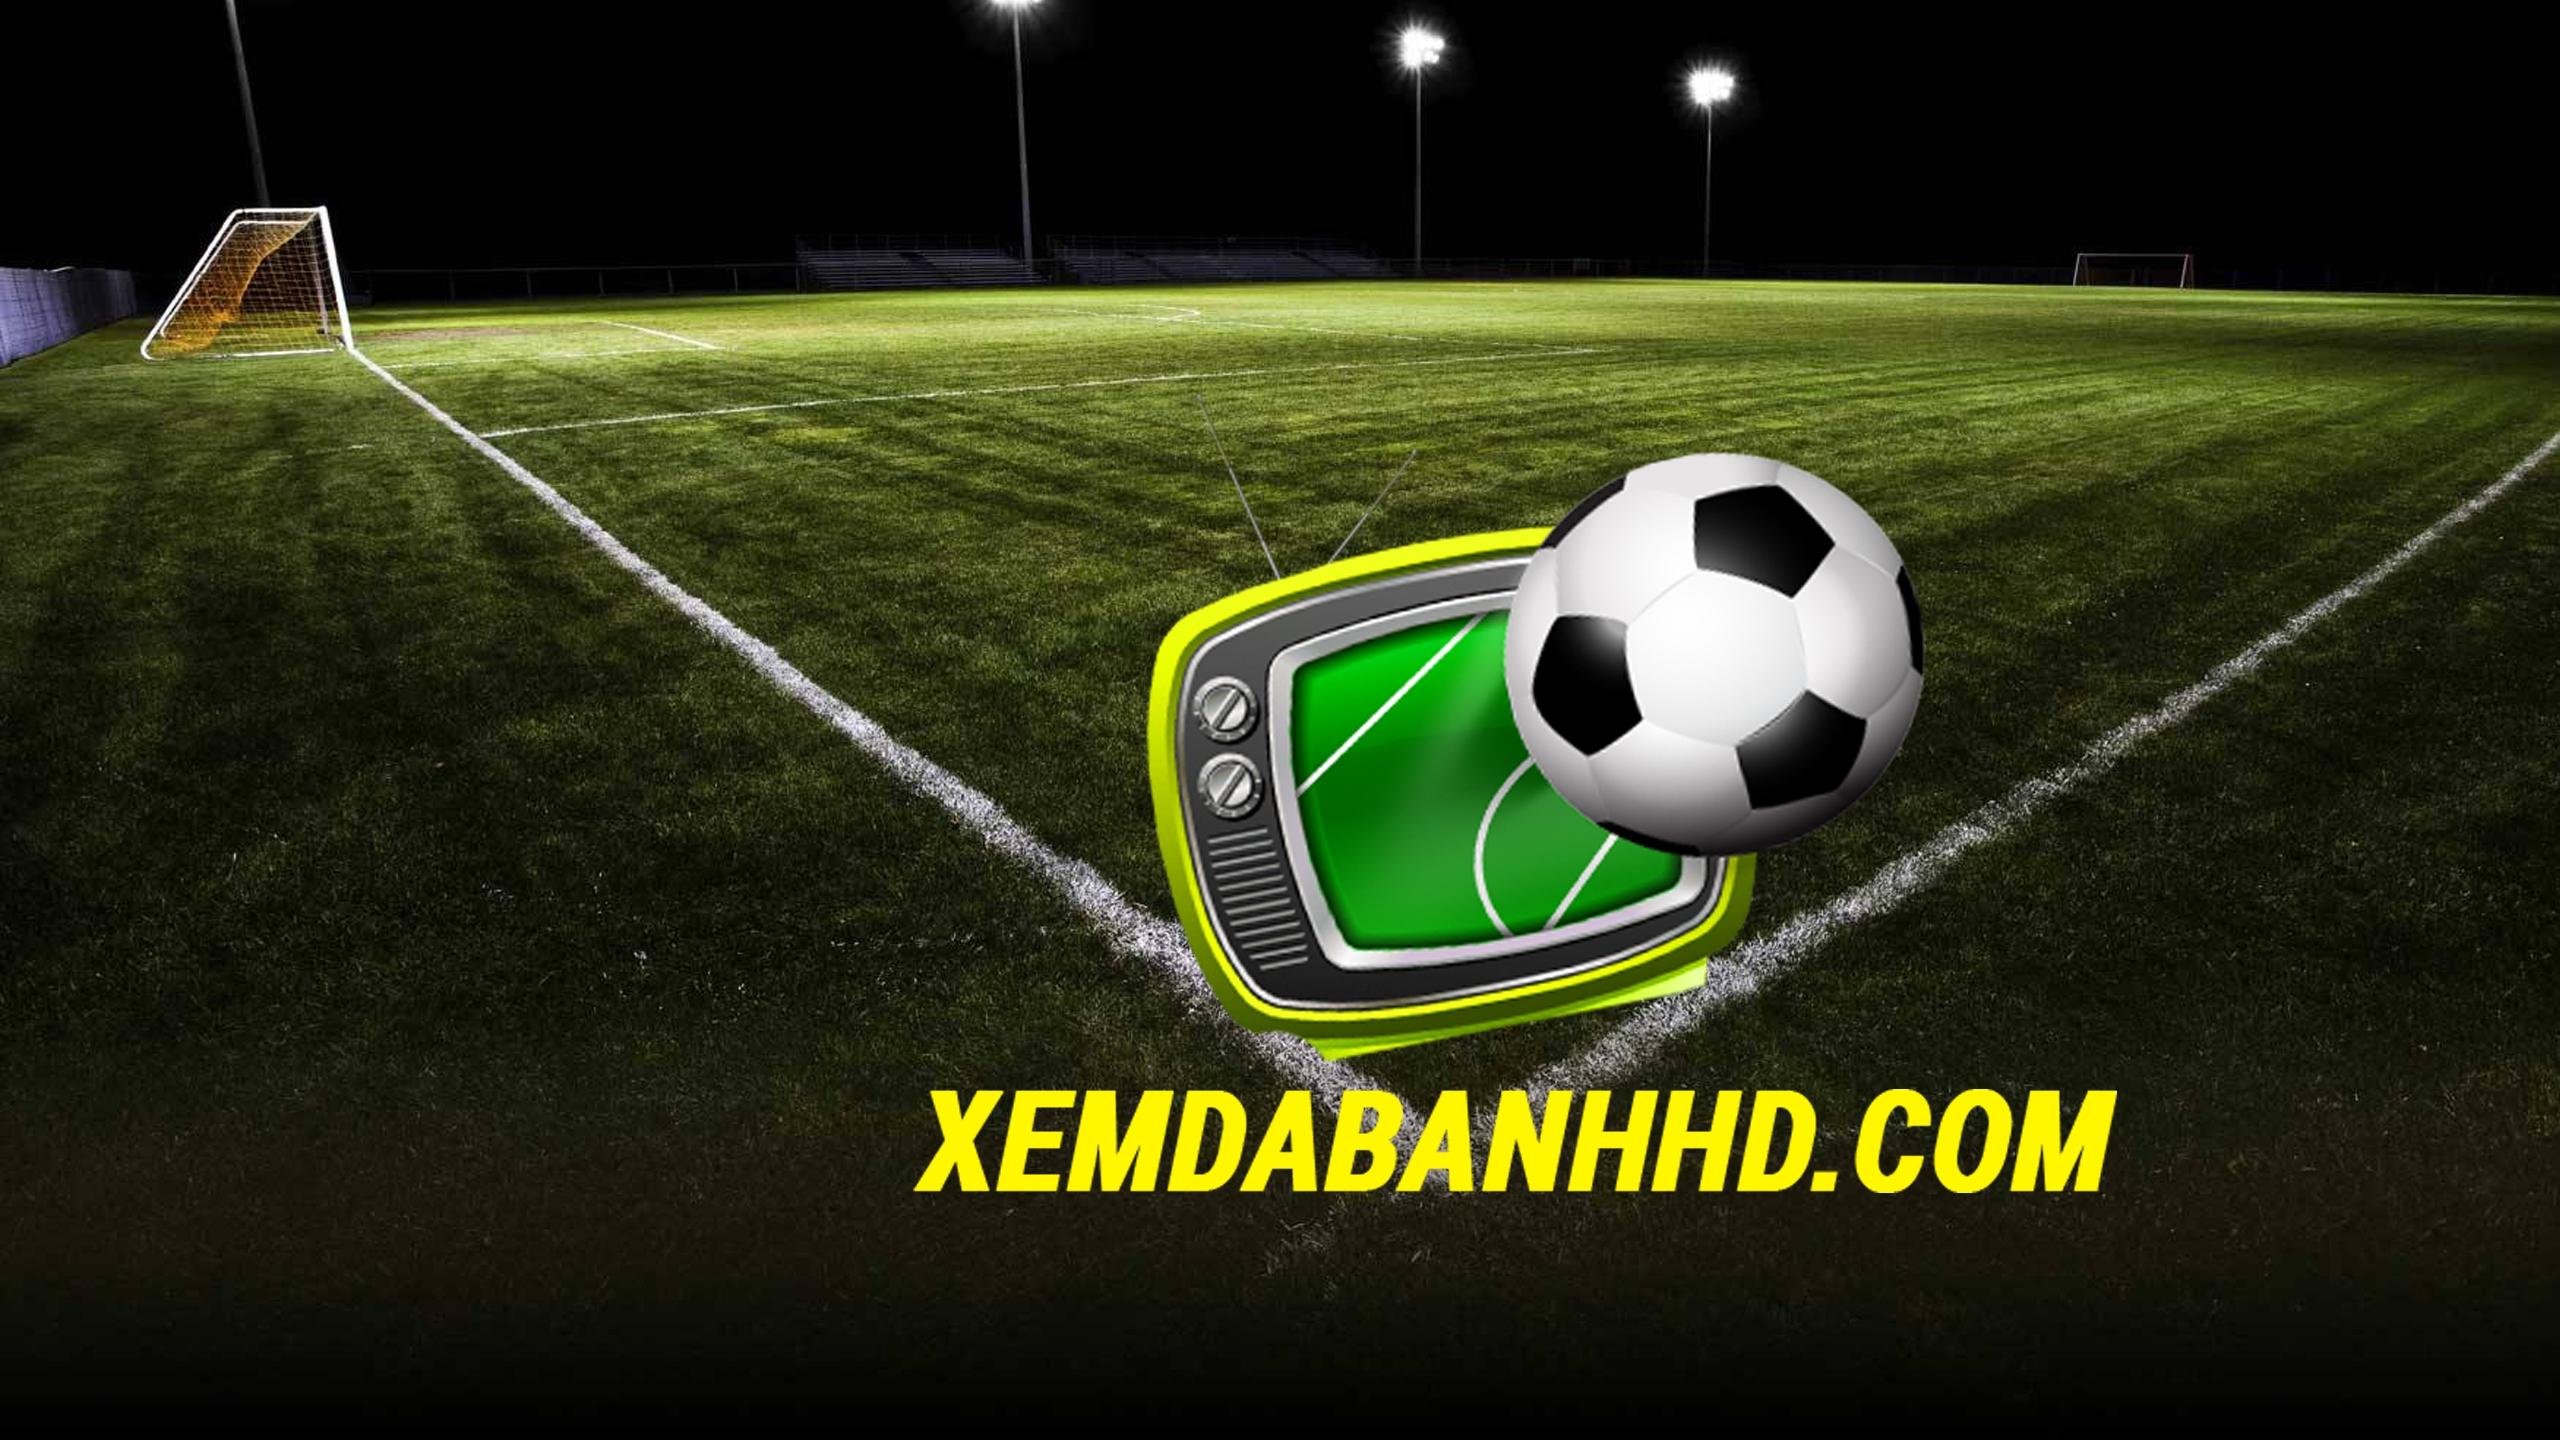 XemDaBanhHD (@xemdabanhhdd) Cover Image